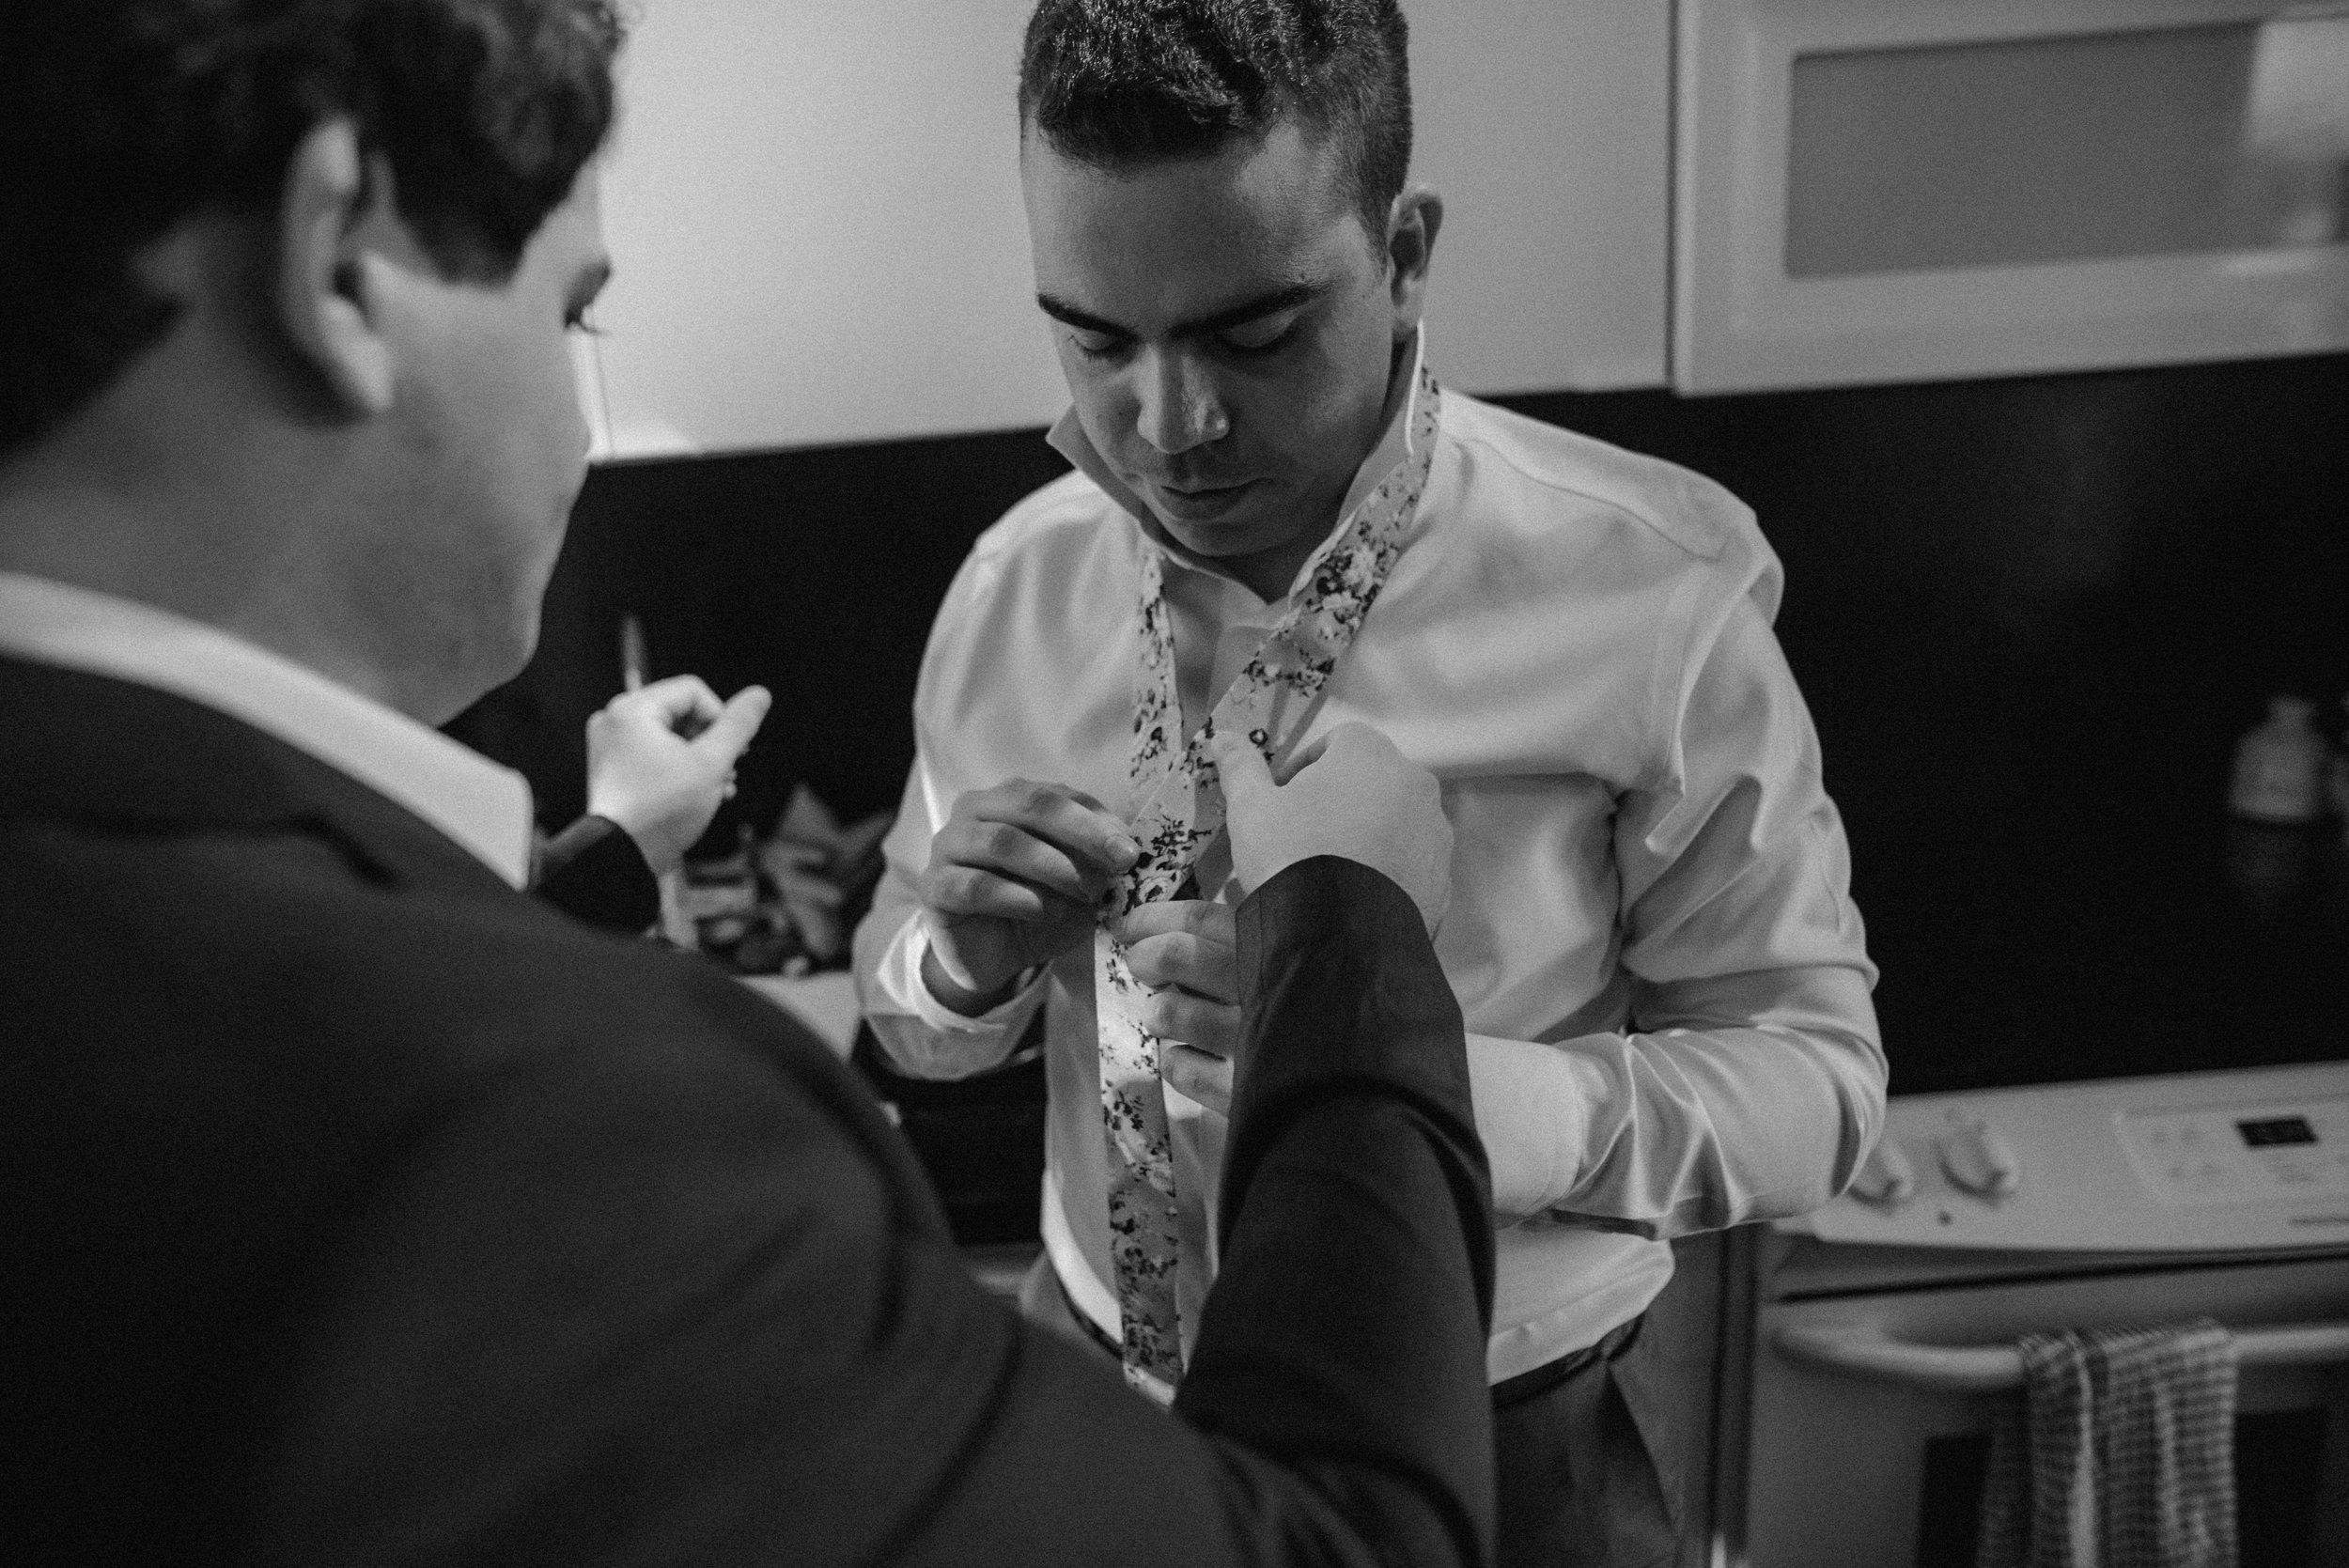 mariage_photographe_toronto_gatineau_ottawa_photographer_wedding-49.jpg